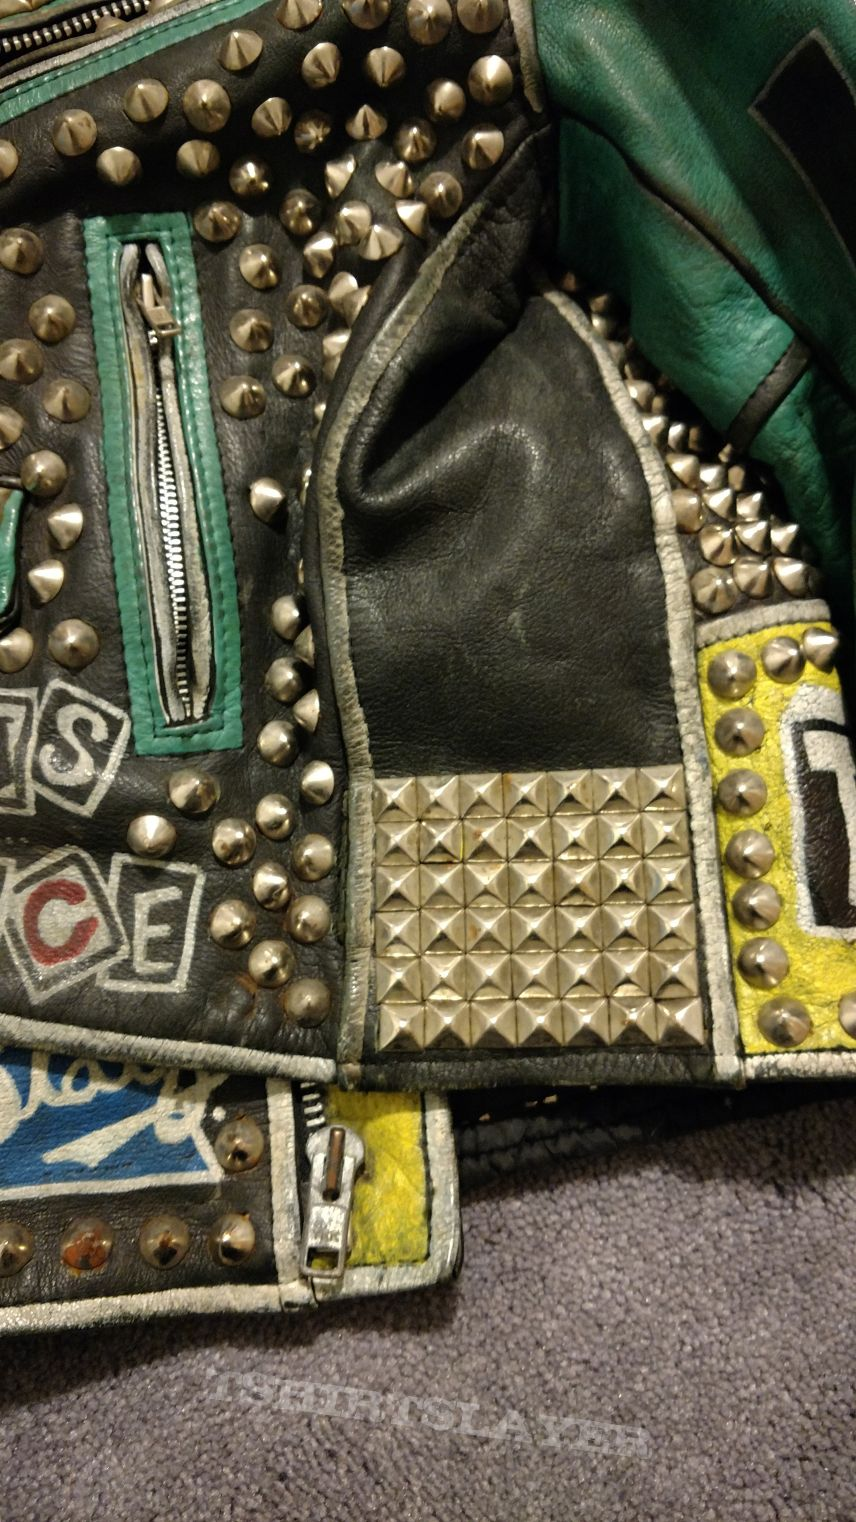 my old punk leather jacket